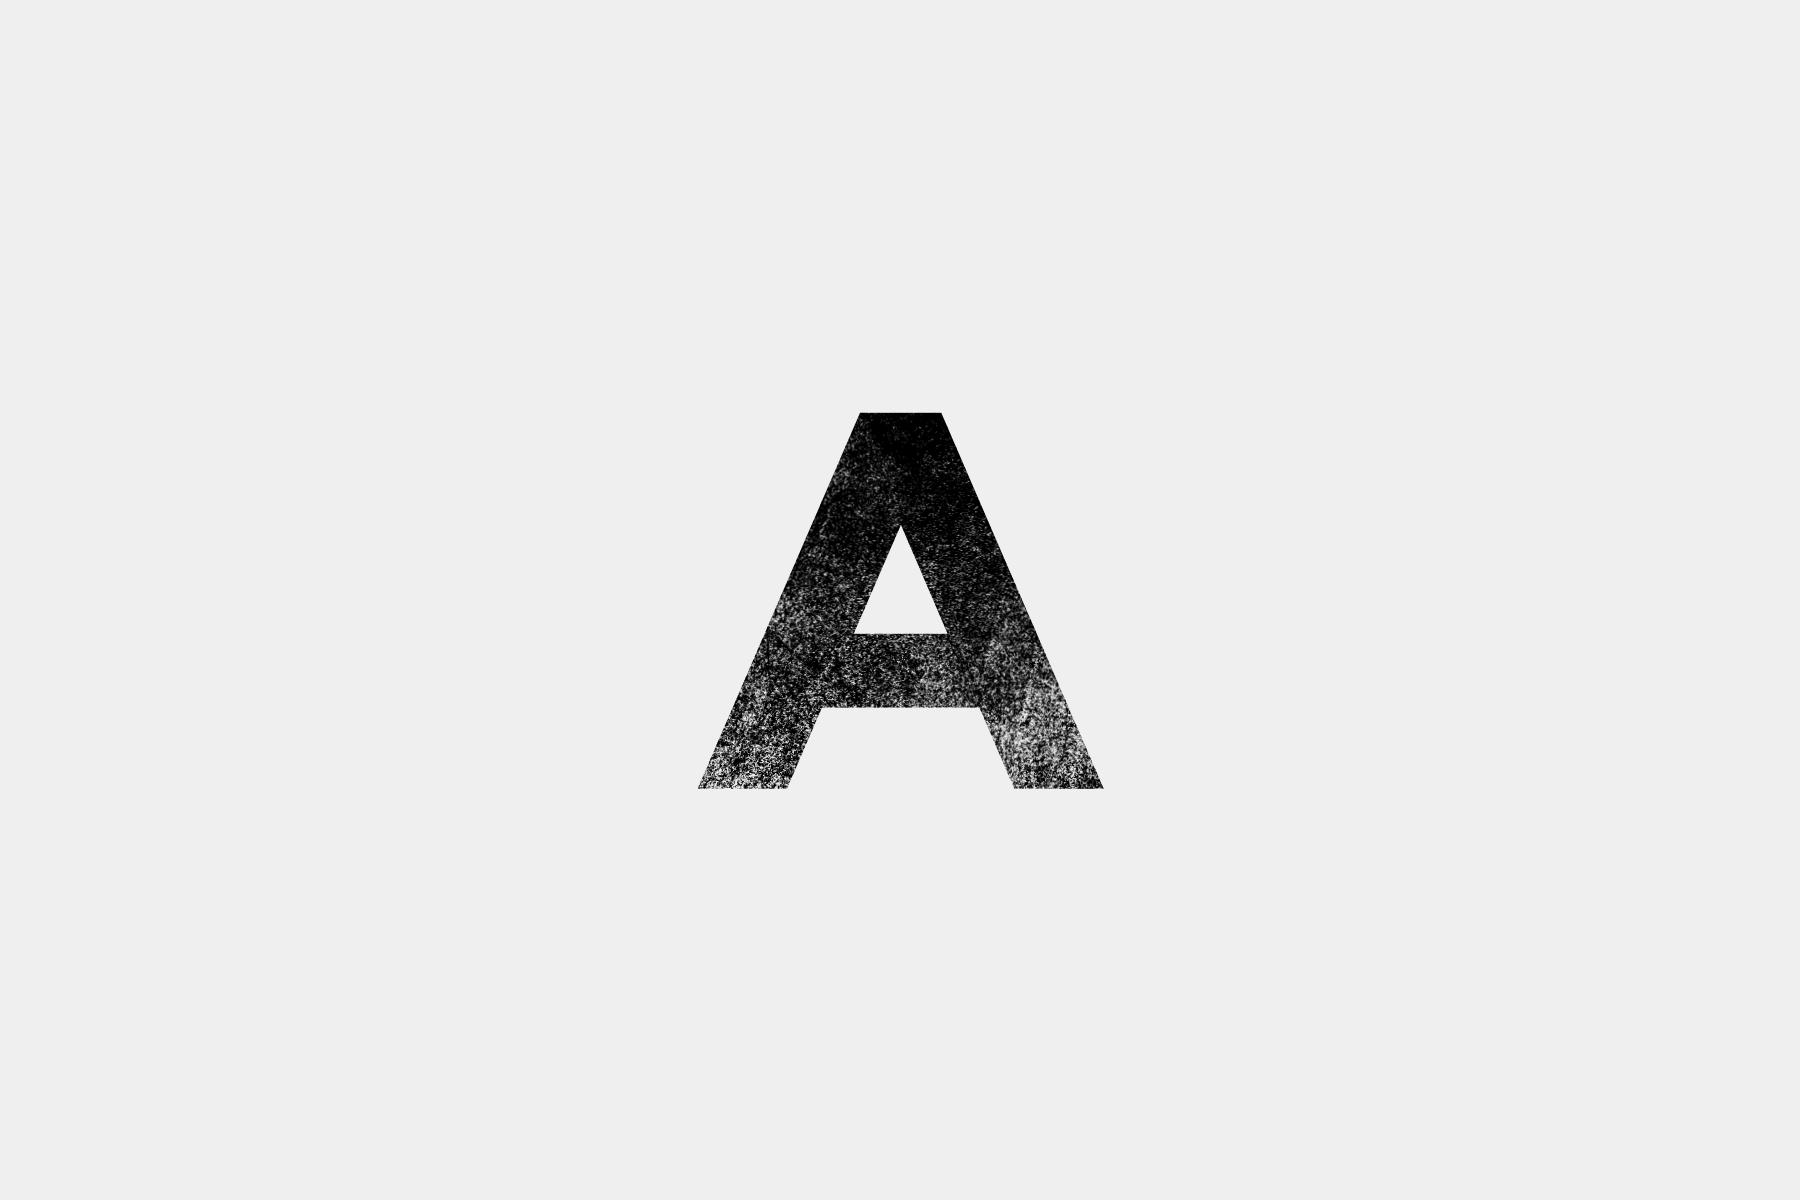 TheAssembly_brand3-1800x1200.jpg